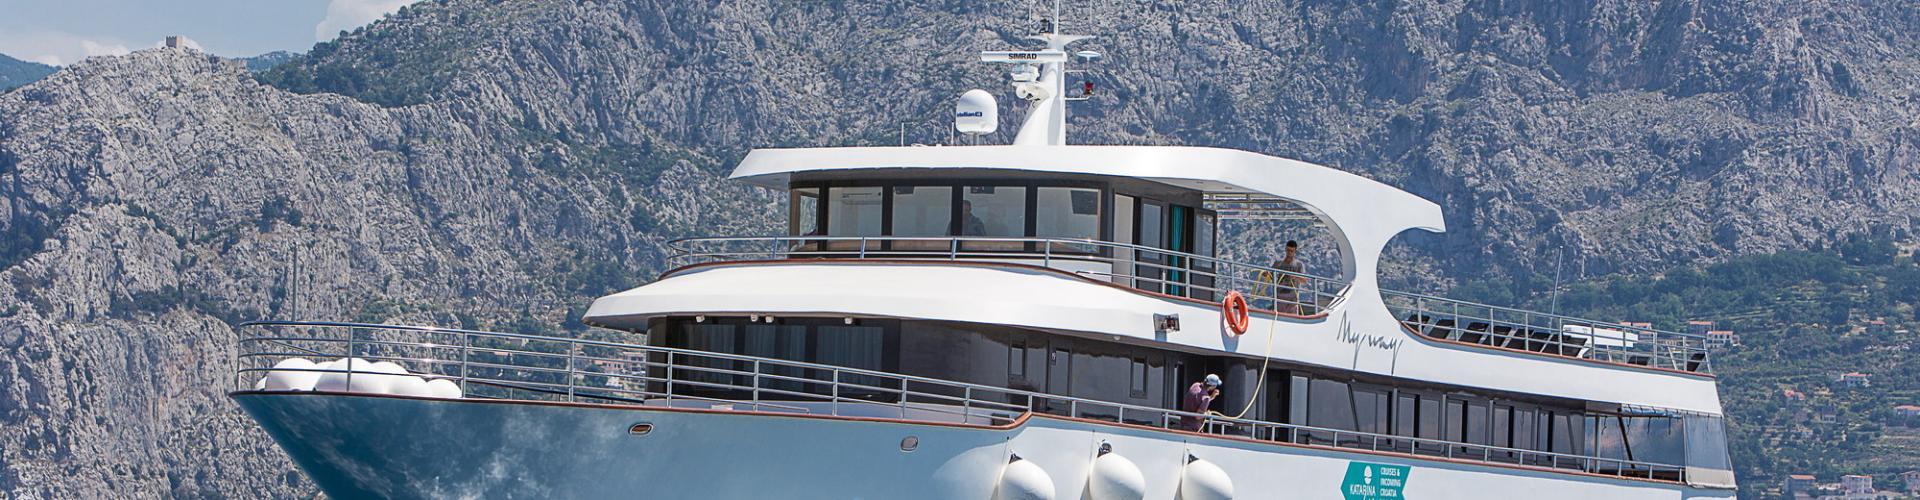 Deluxe cruiser MV My Way- motor yacht